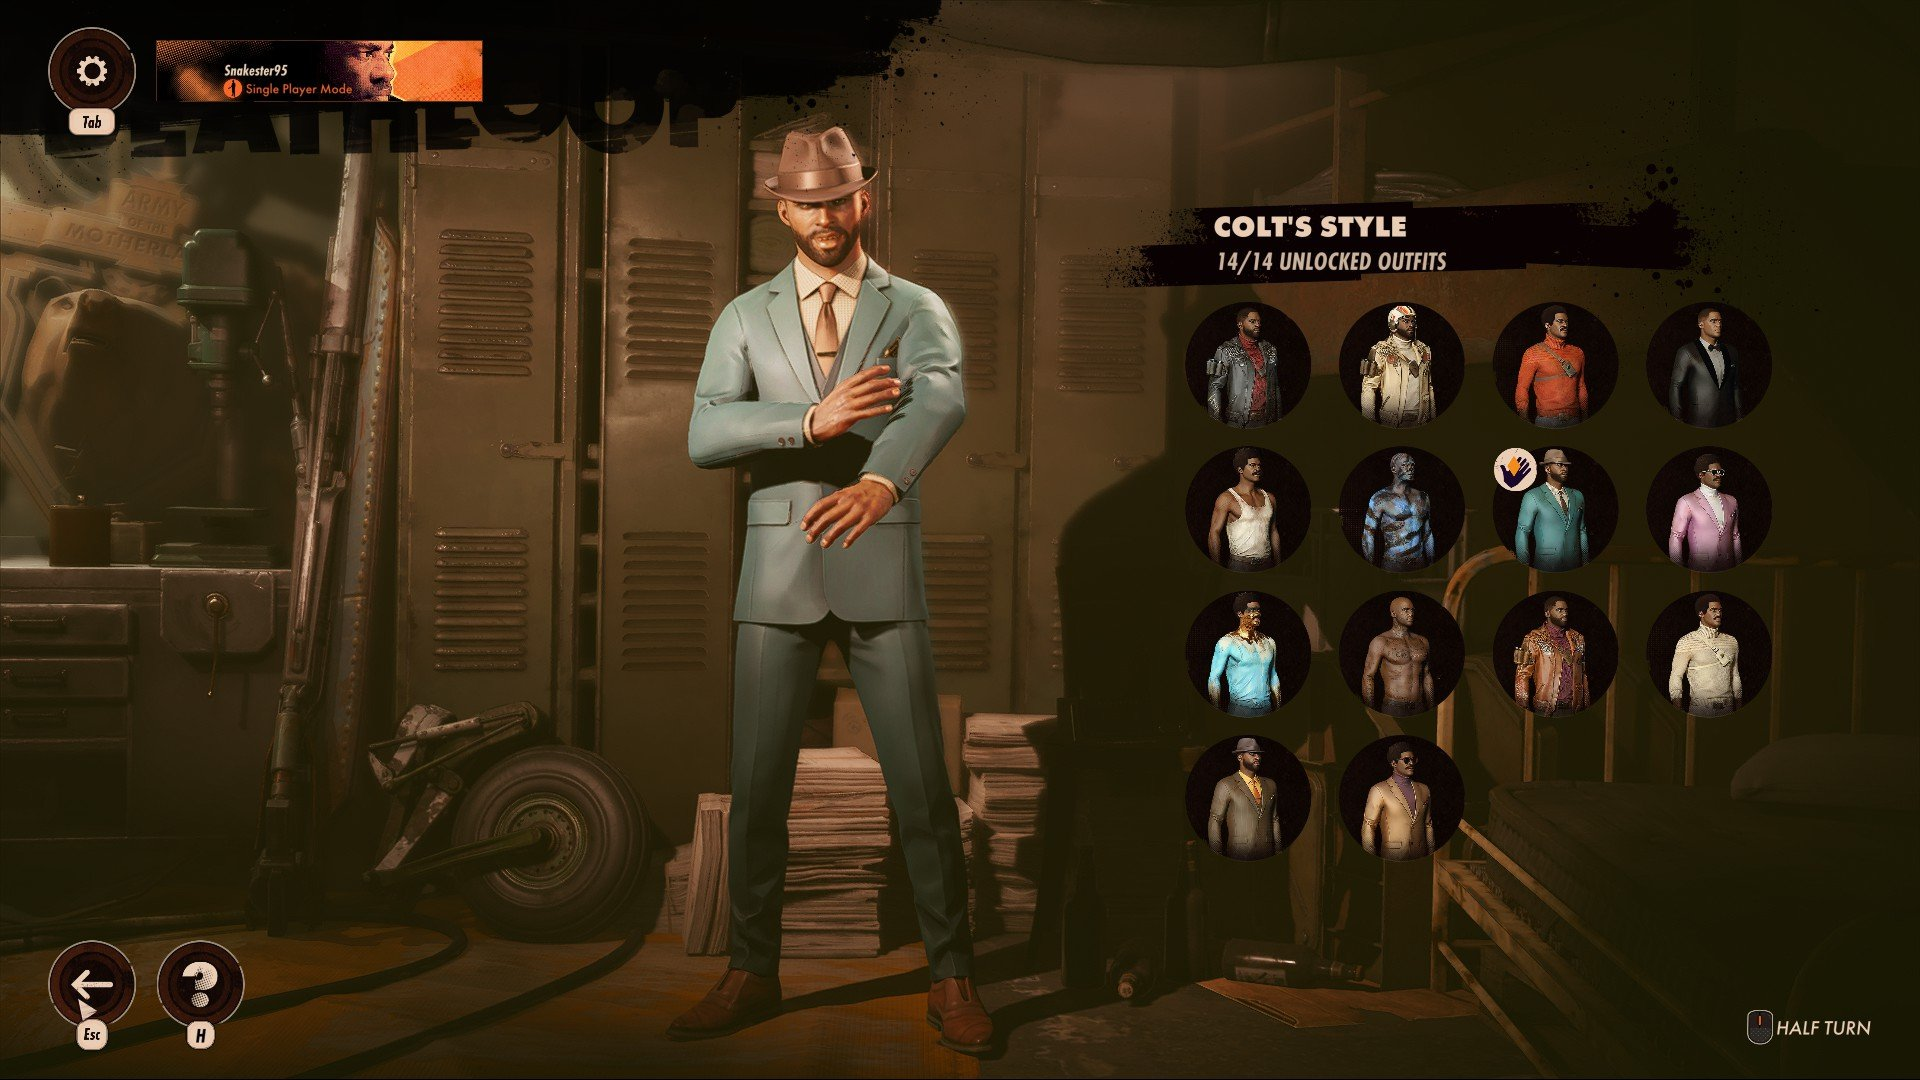 Deathloop - How to Unlock Outfits